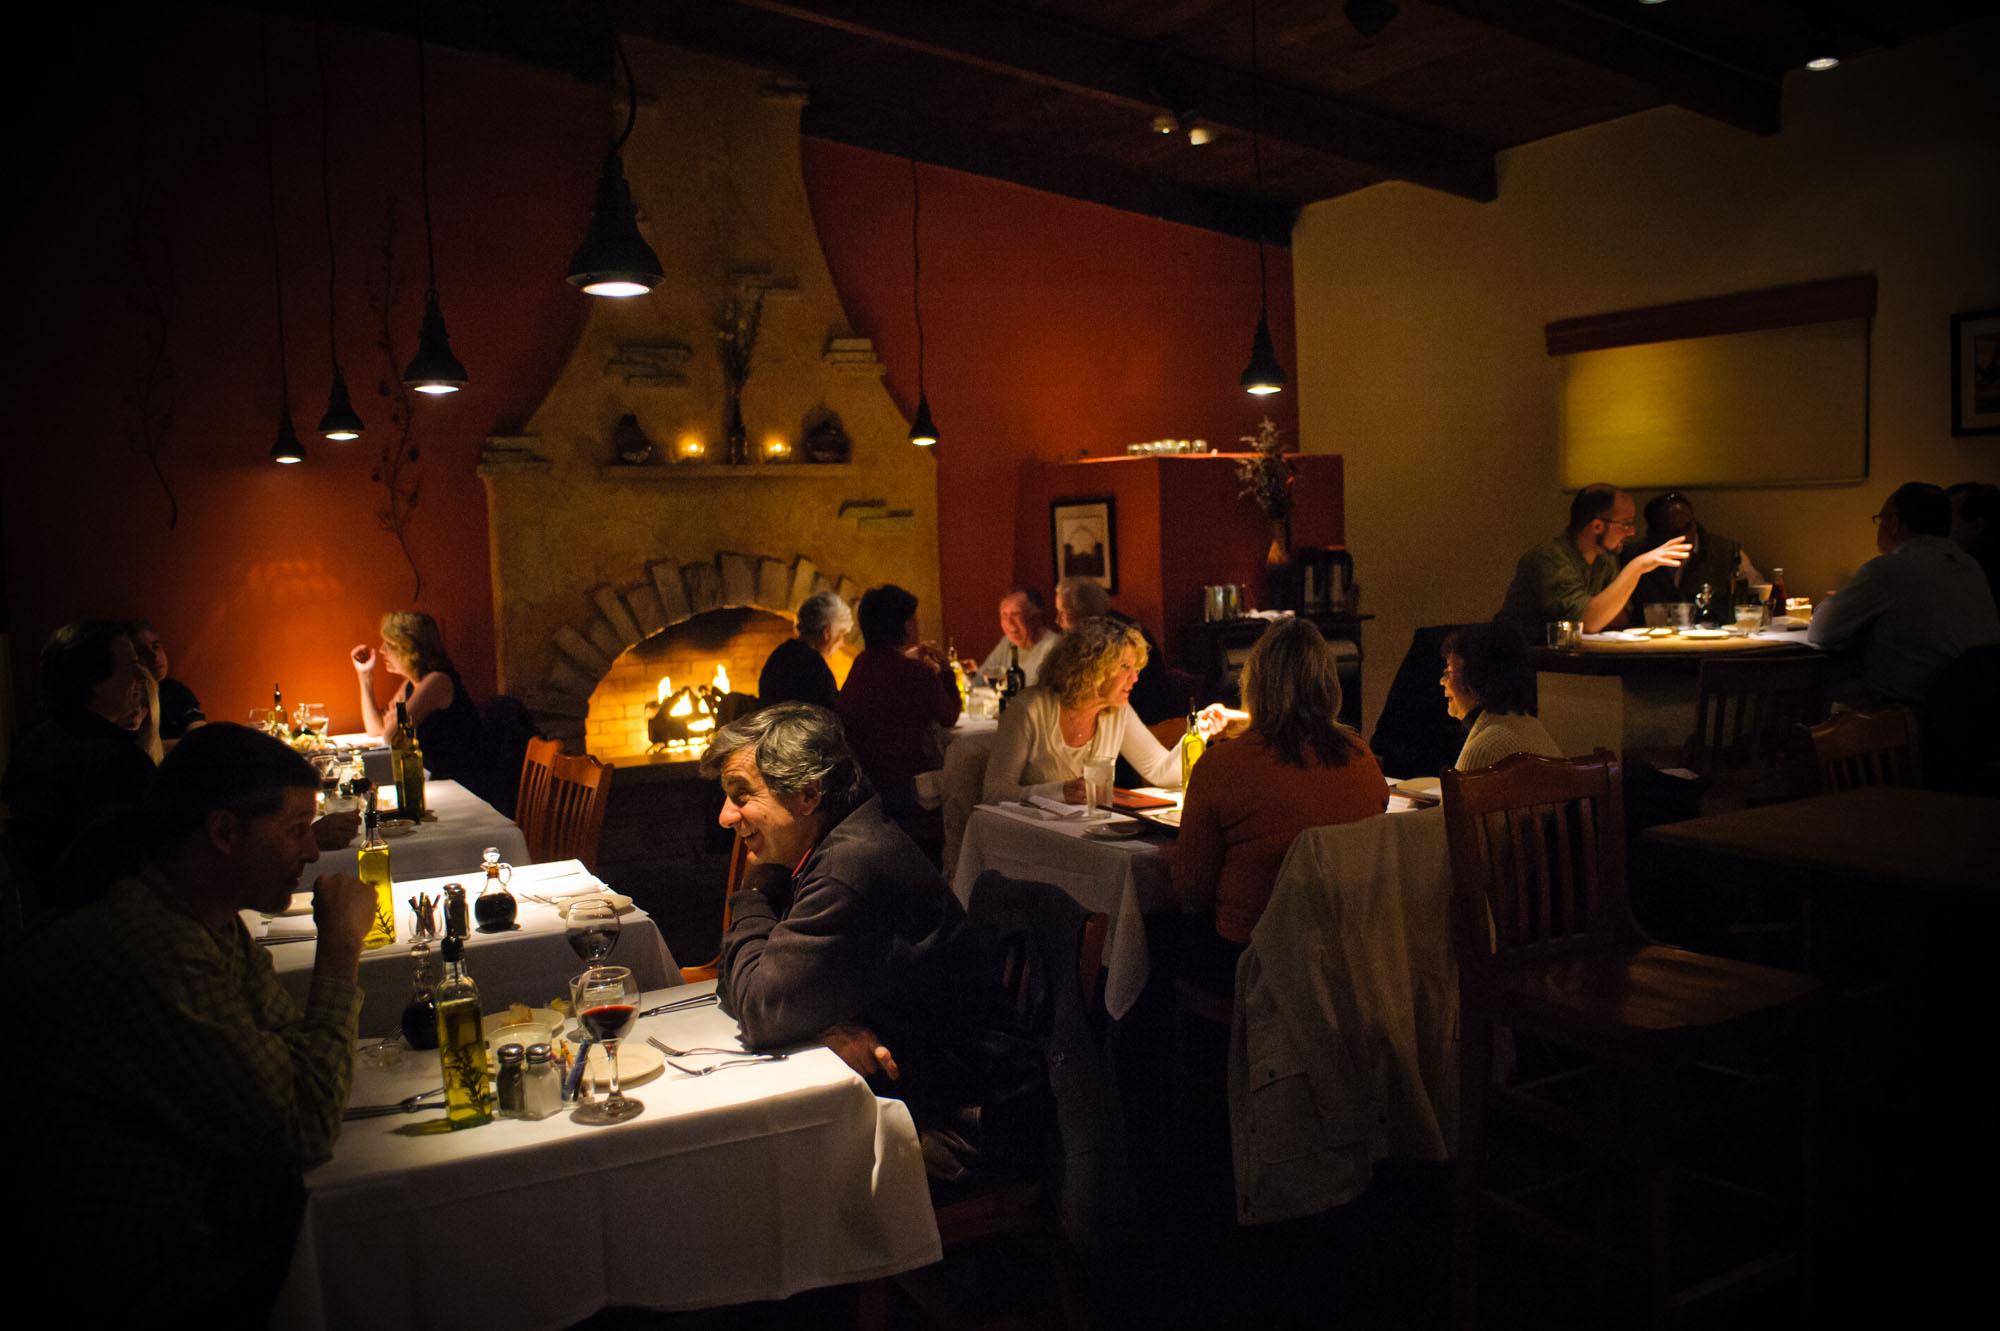 2336-Cruz_Cafe_Soquel_Restaurant_Photography_d3.jpg